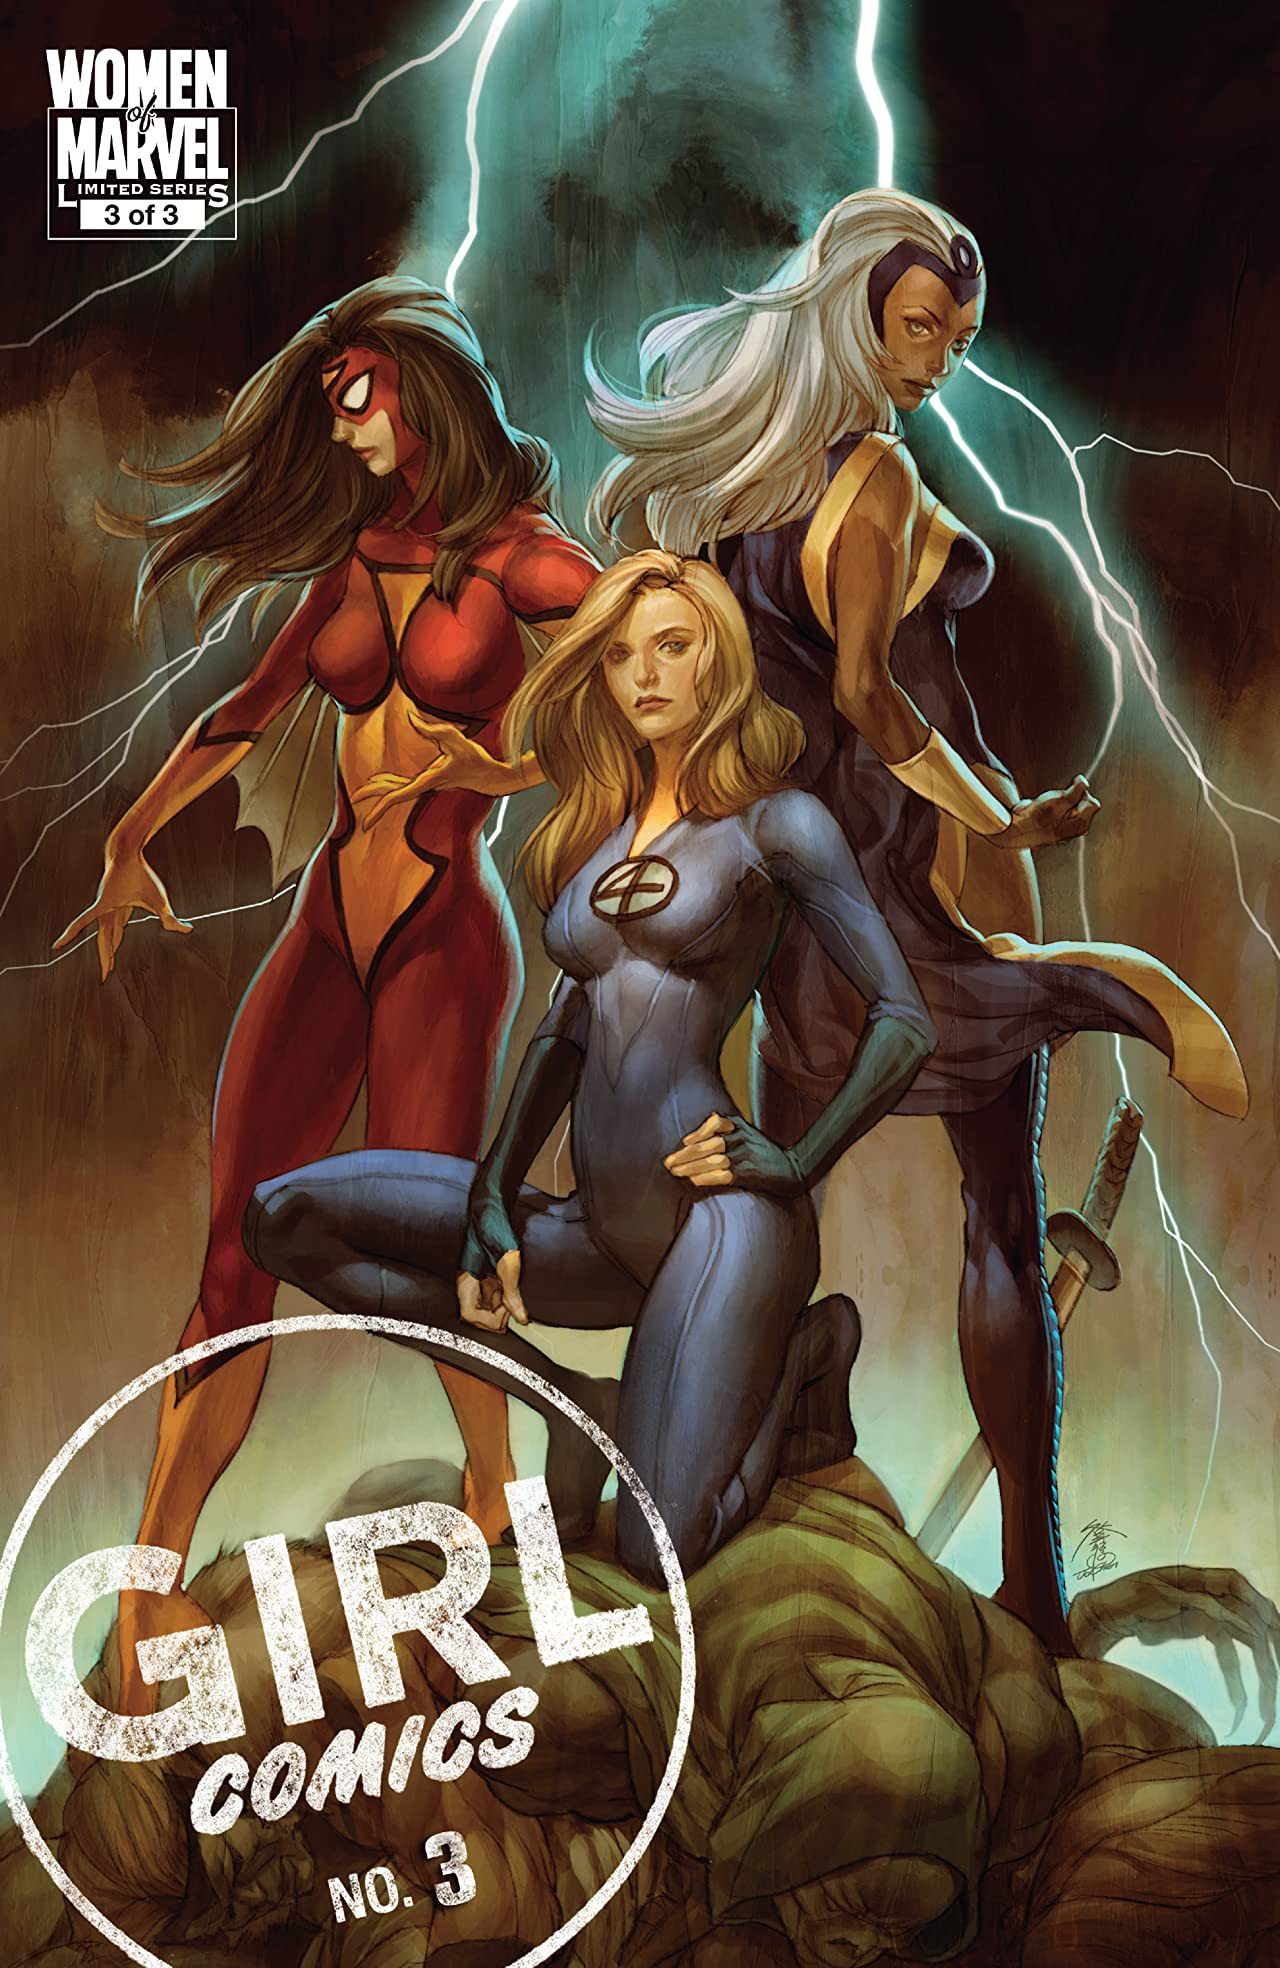 Girl Comics (2010) #3 (of 3)